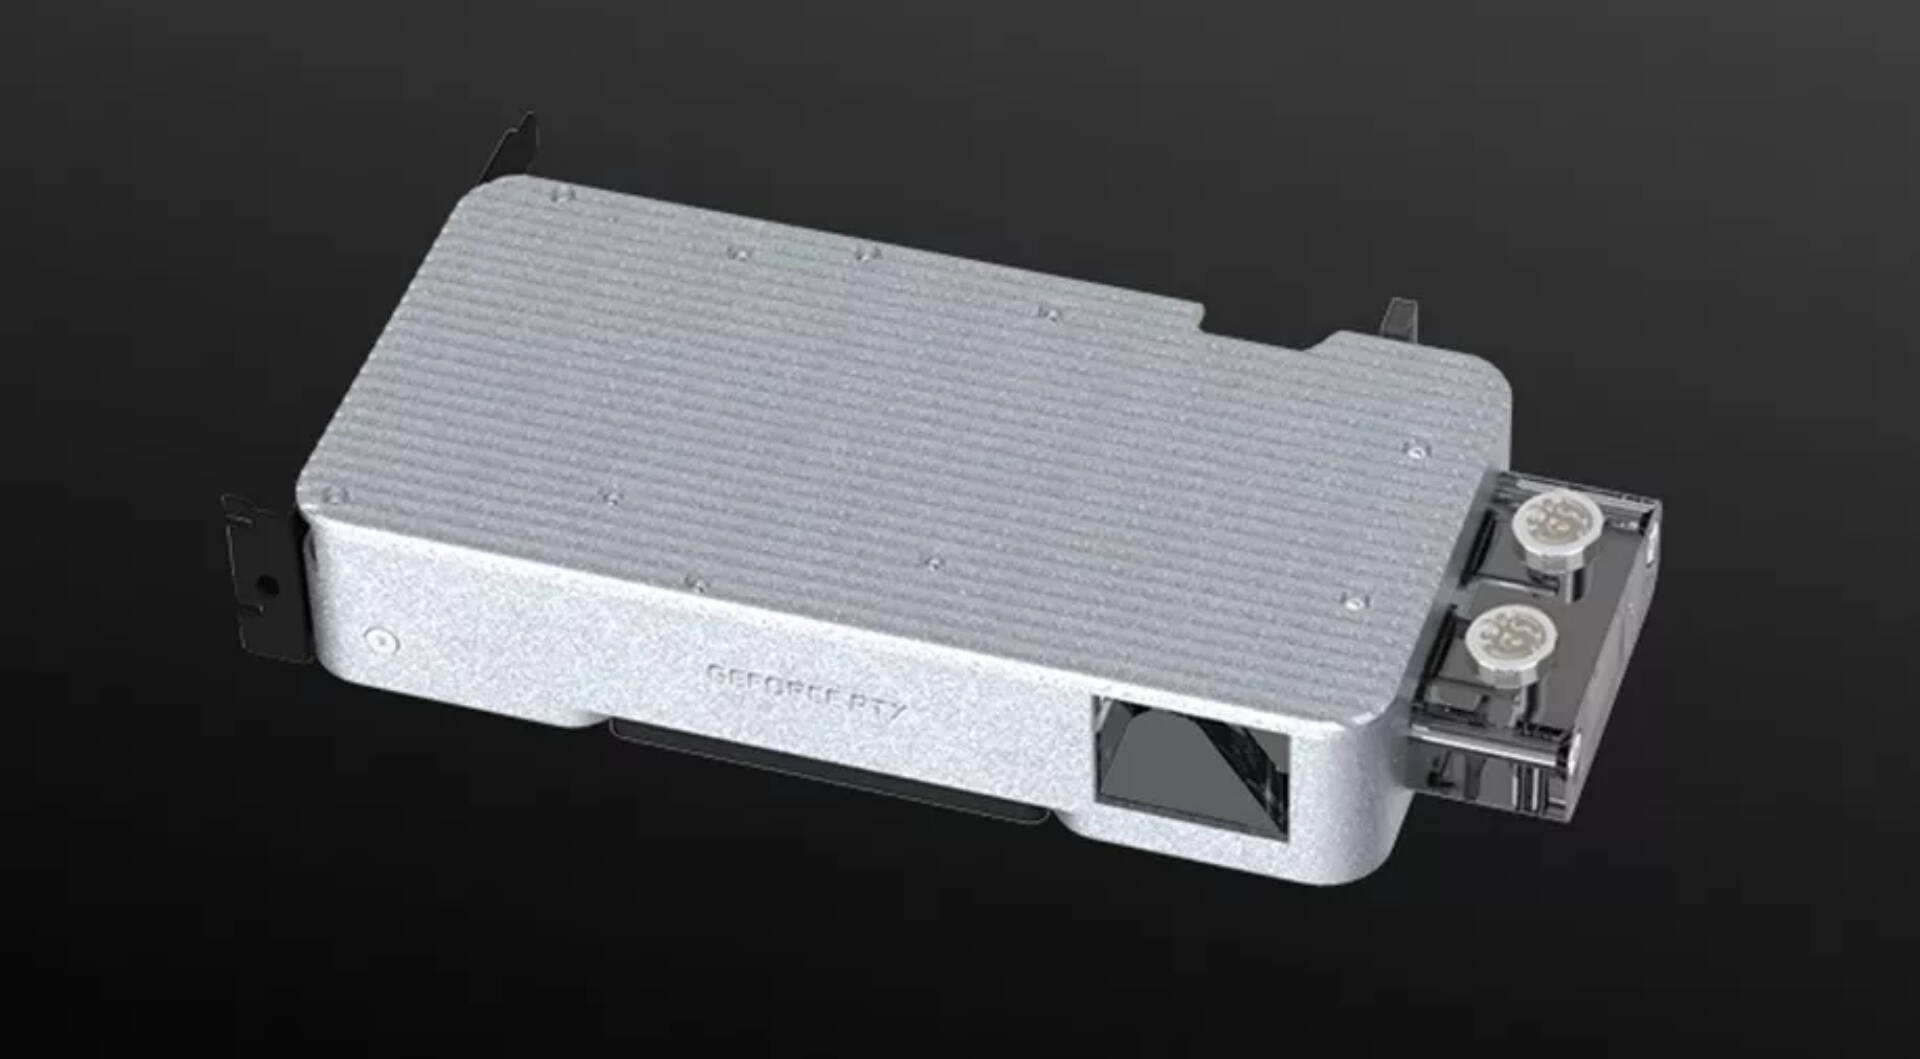 Bitspower RTX 3080 Mobius